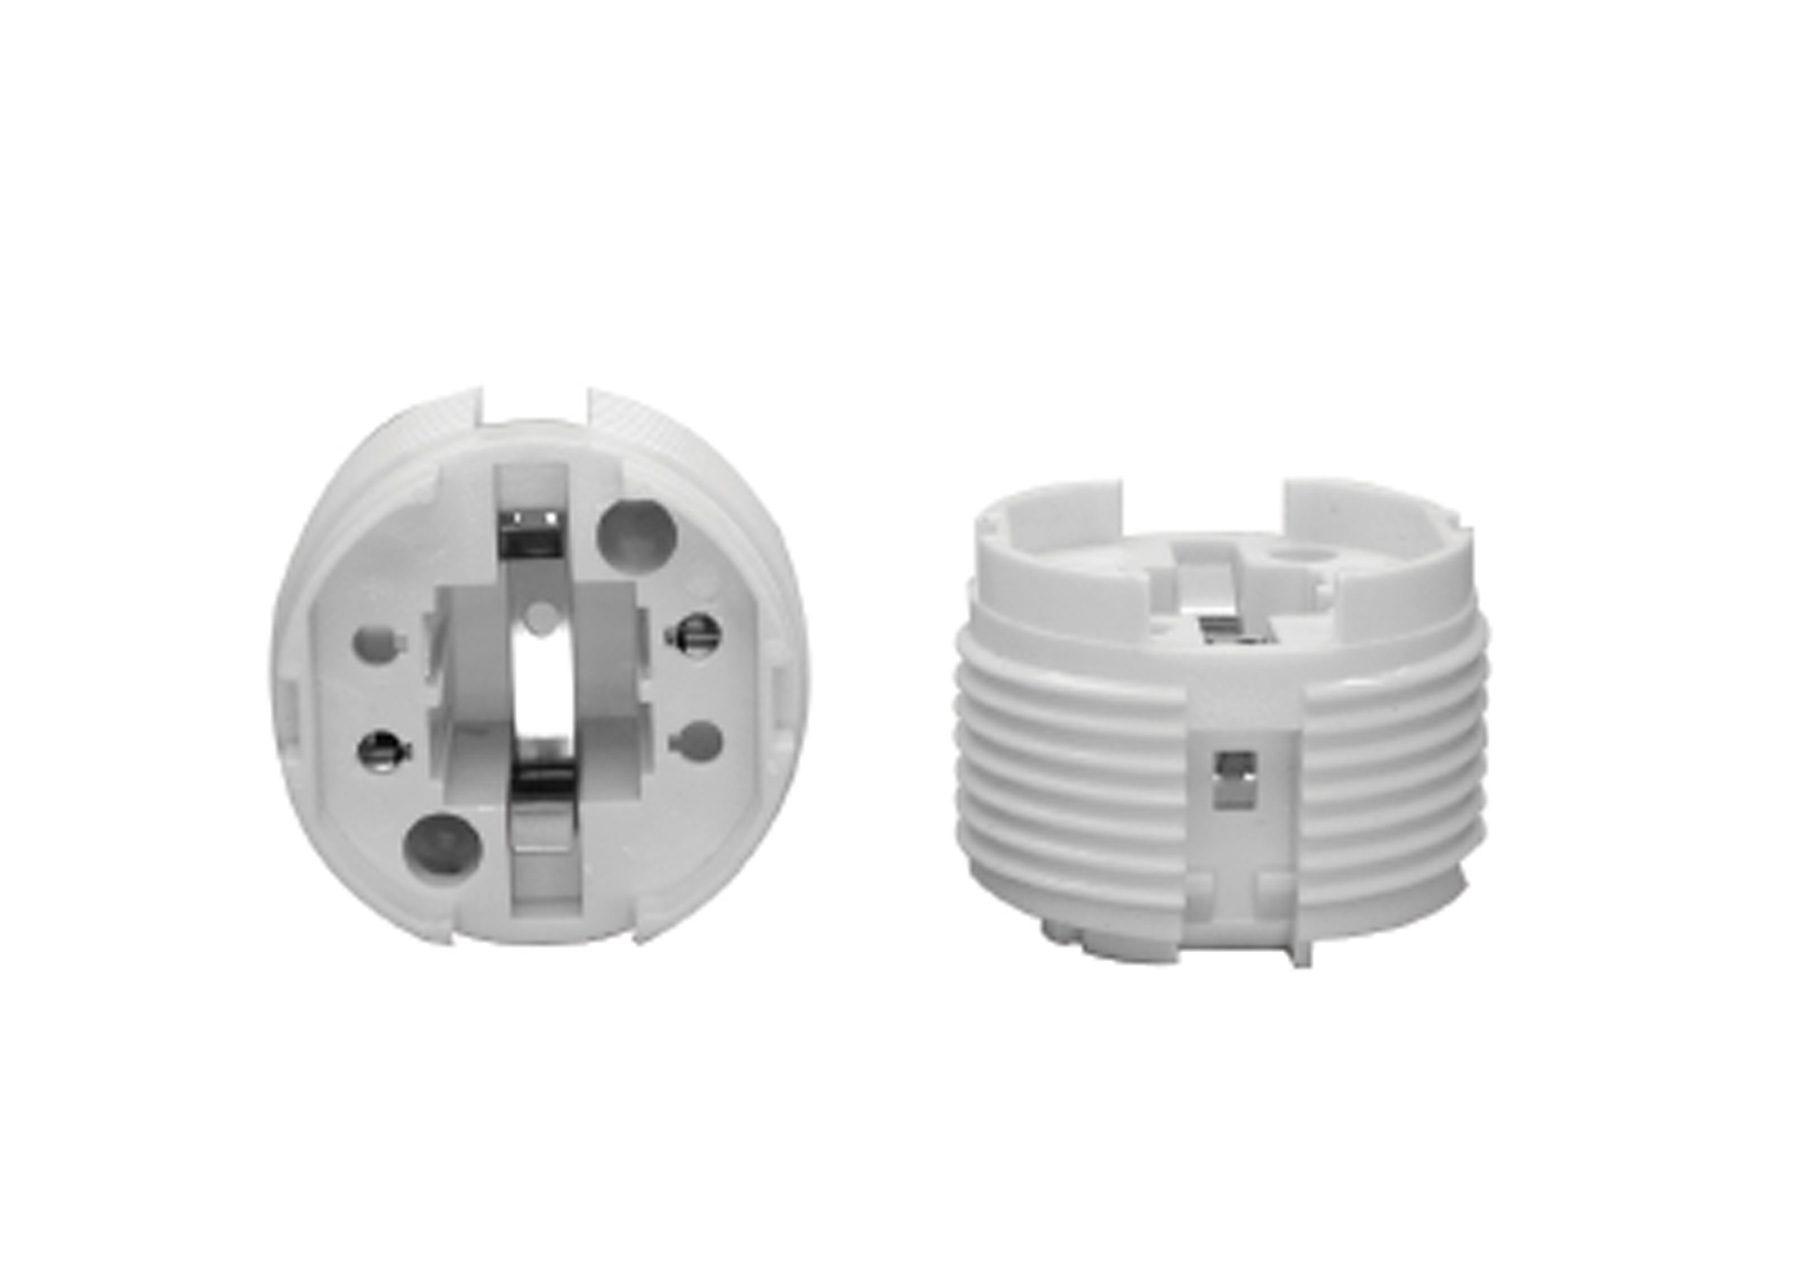 GX24-D CFL Light Socket